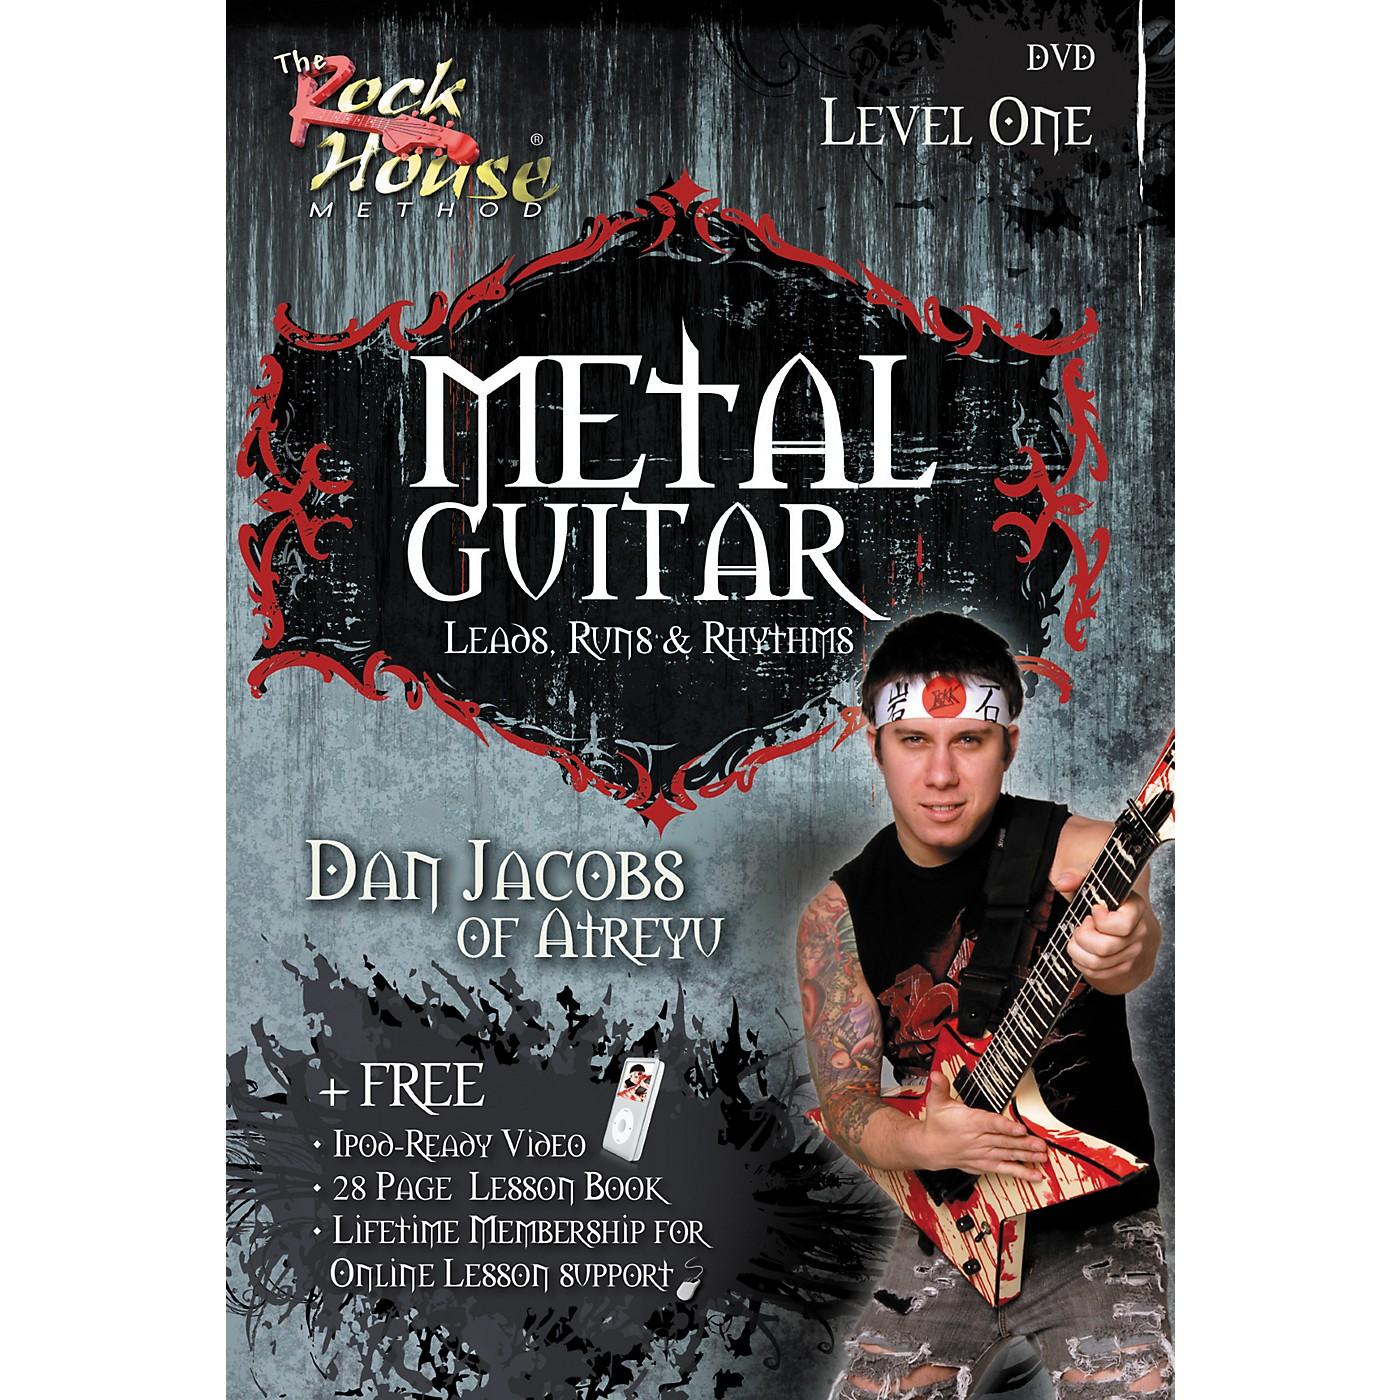 Hal Leonard Metal Guitar with Leads, Runs & Rhythms with Dan Jacobs DVD thumbnail